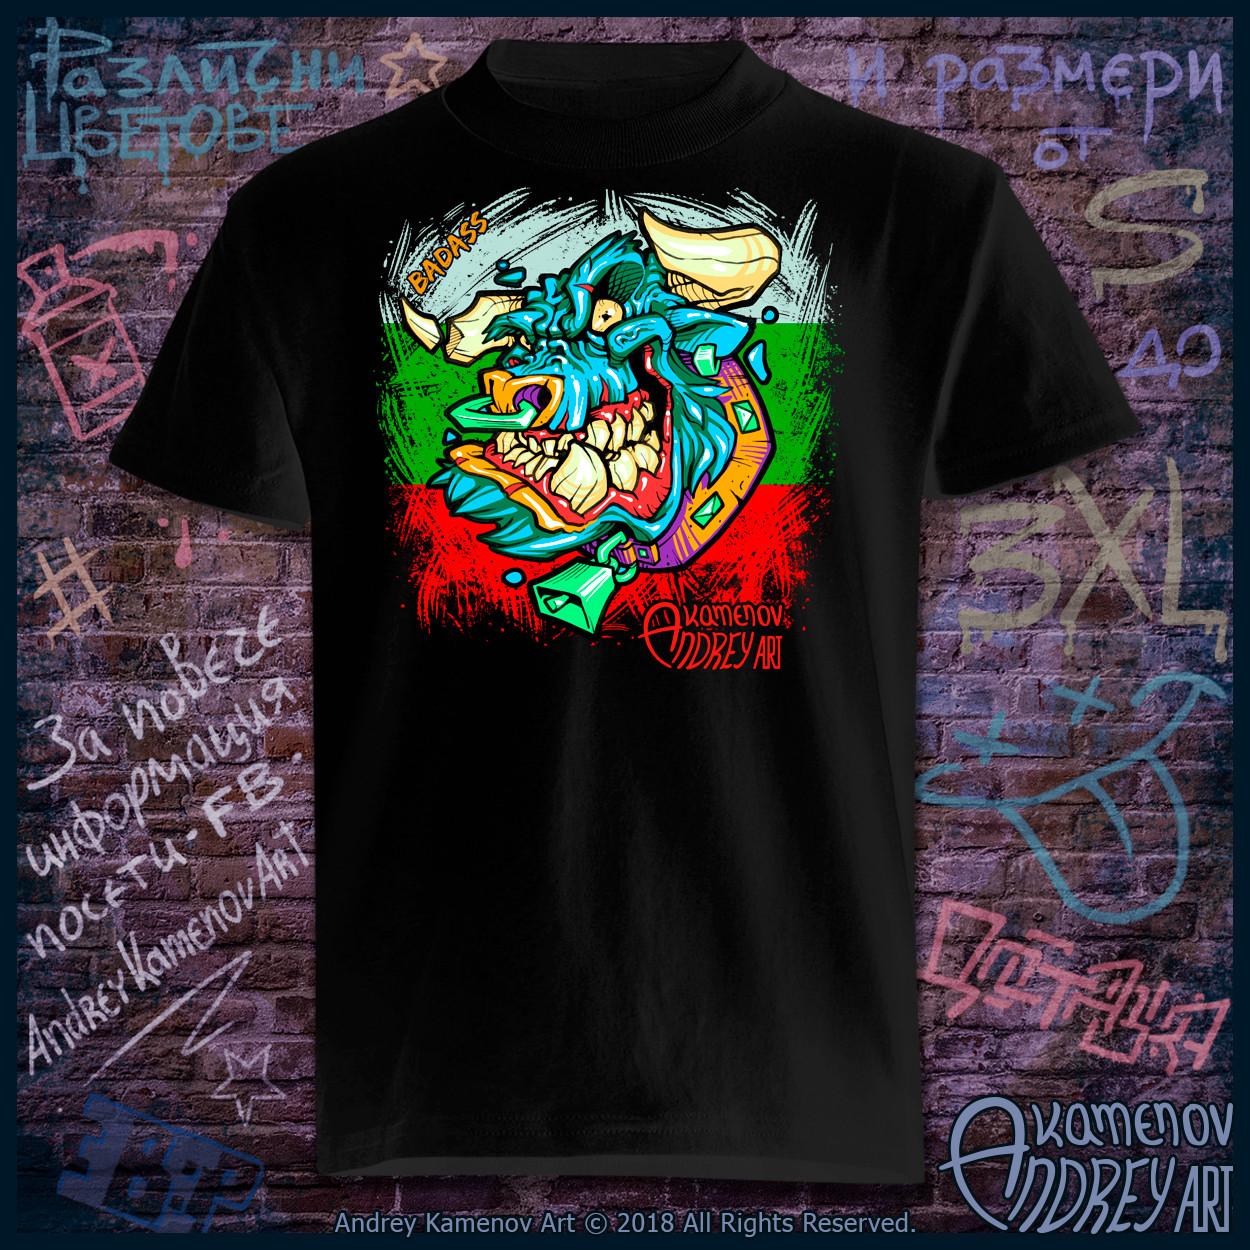 Andrey kamenov badass bull t shirt bg 01